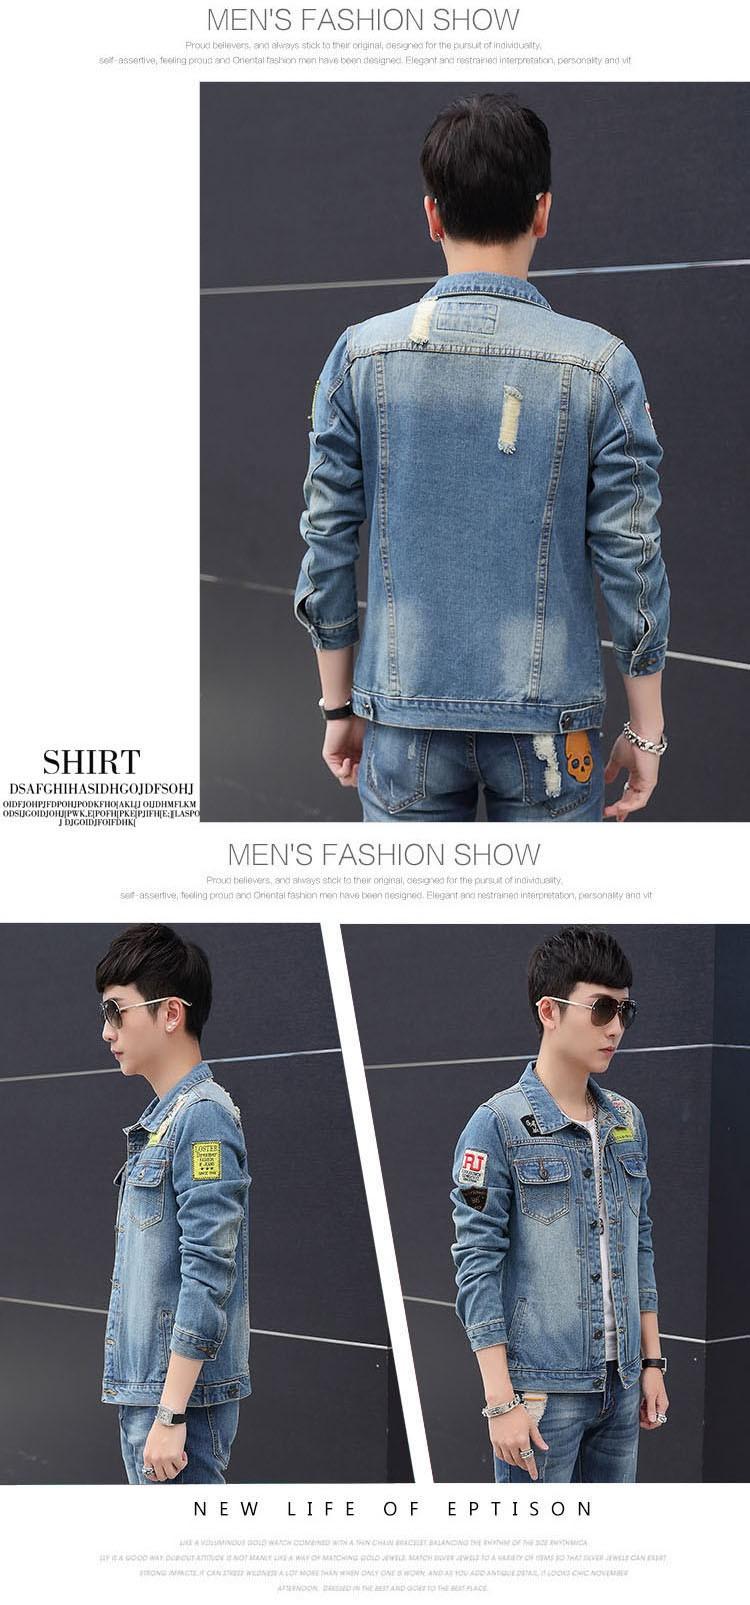 Men's Denim Jacket high quality fashion Jeans Jackets Slim fit casual streetwear Vintage Mens jean clothing Plus Size M-5XL (7)